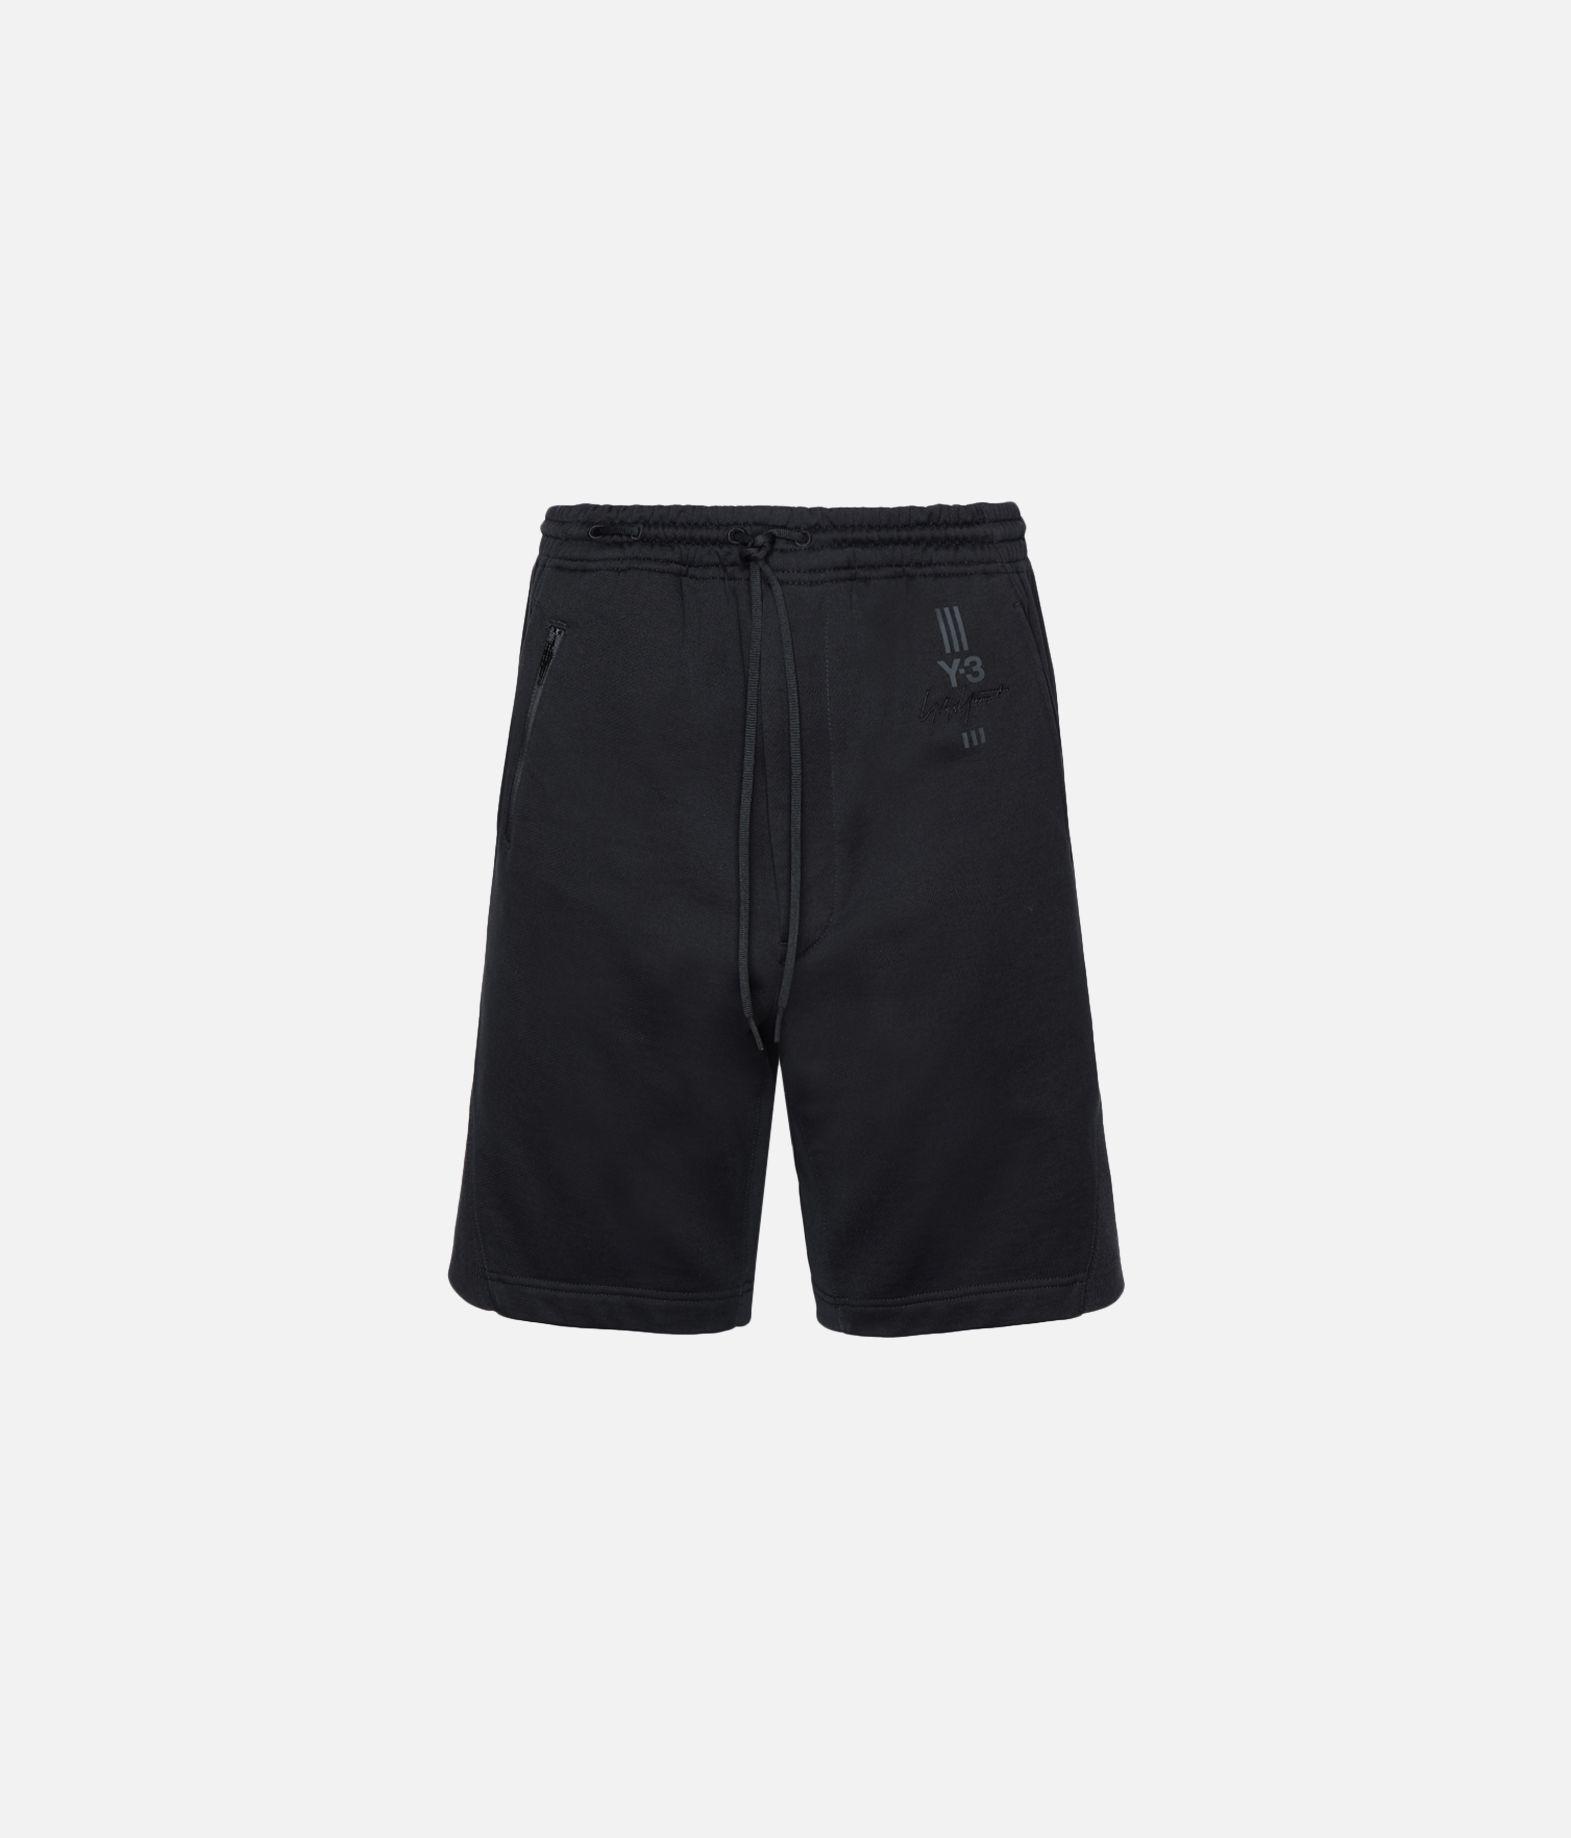 Y-3 Y-3 Classic Shorts ショートパンツ レディース f